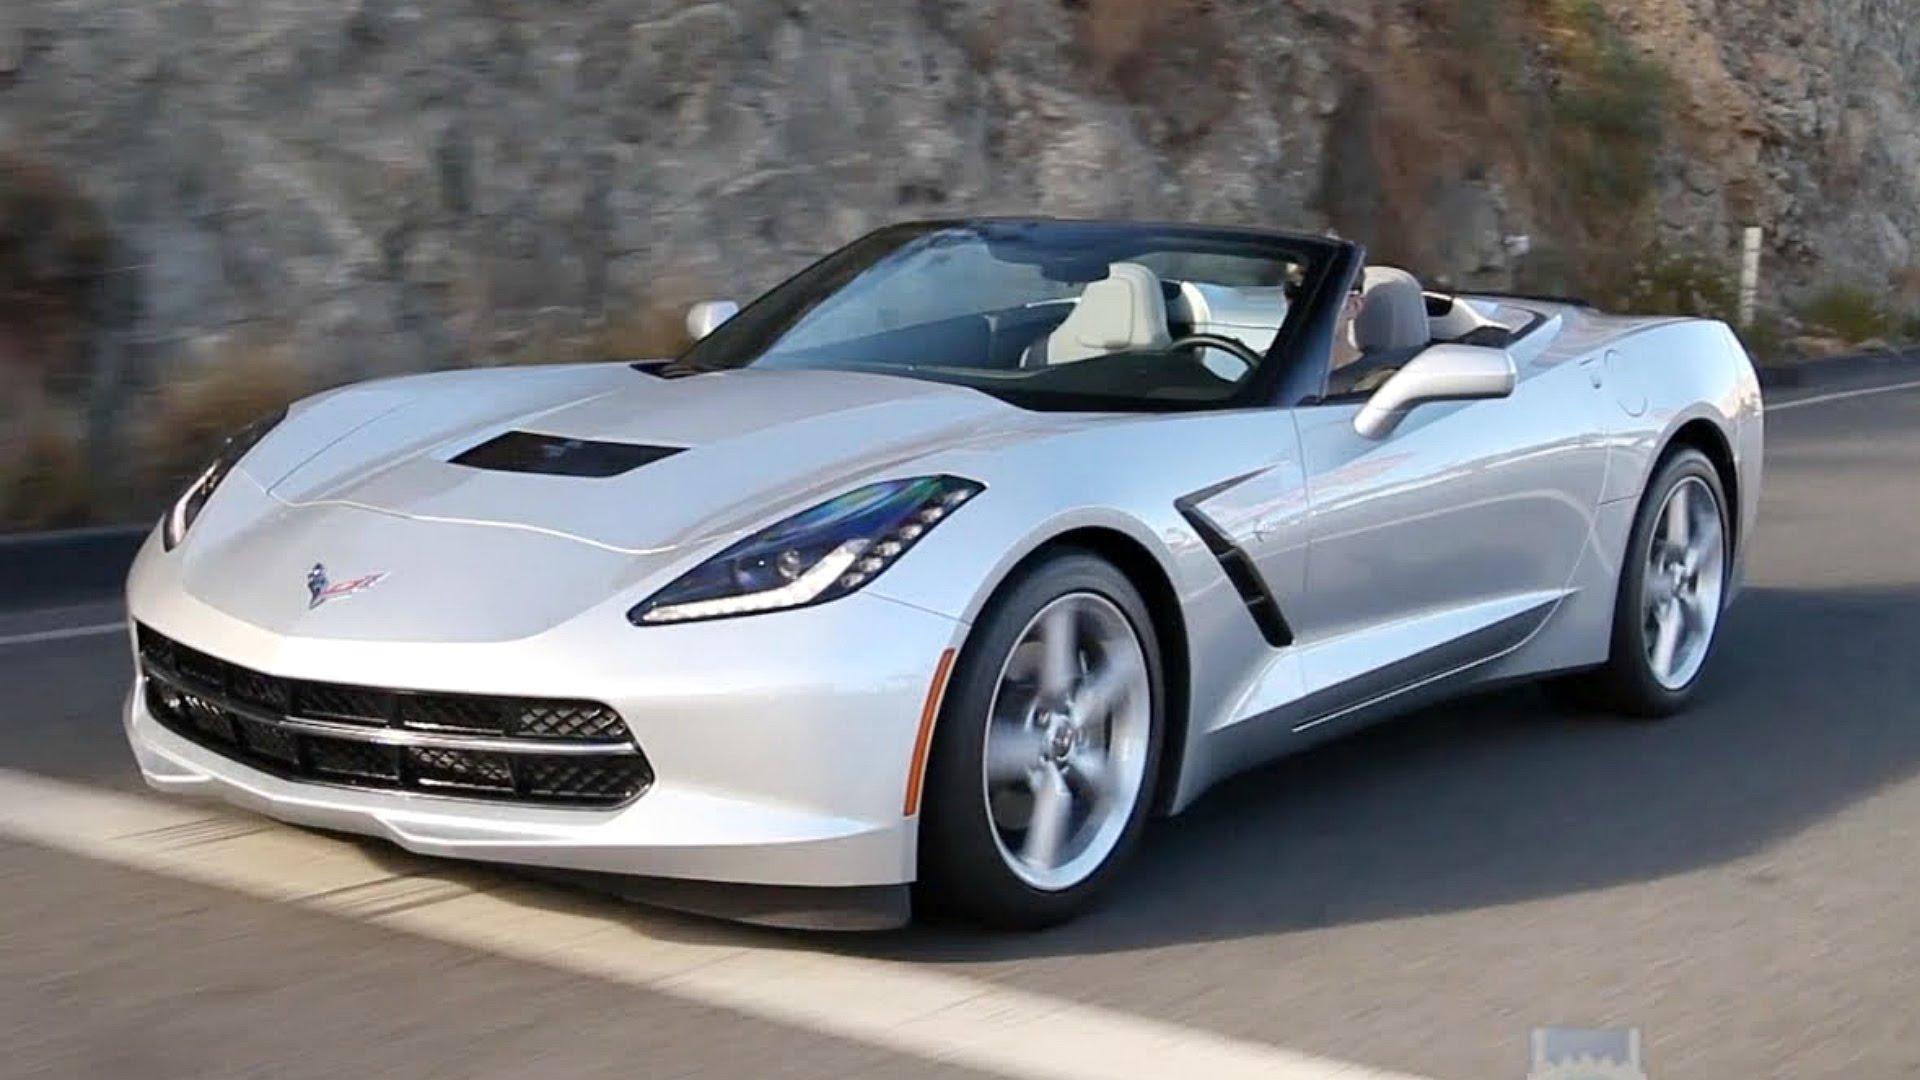 2014 Chevy Corvette Stingray Convertible Review – Kelley Blue Book